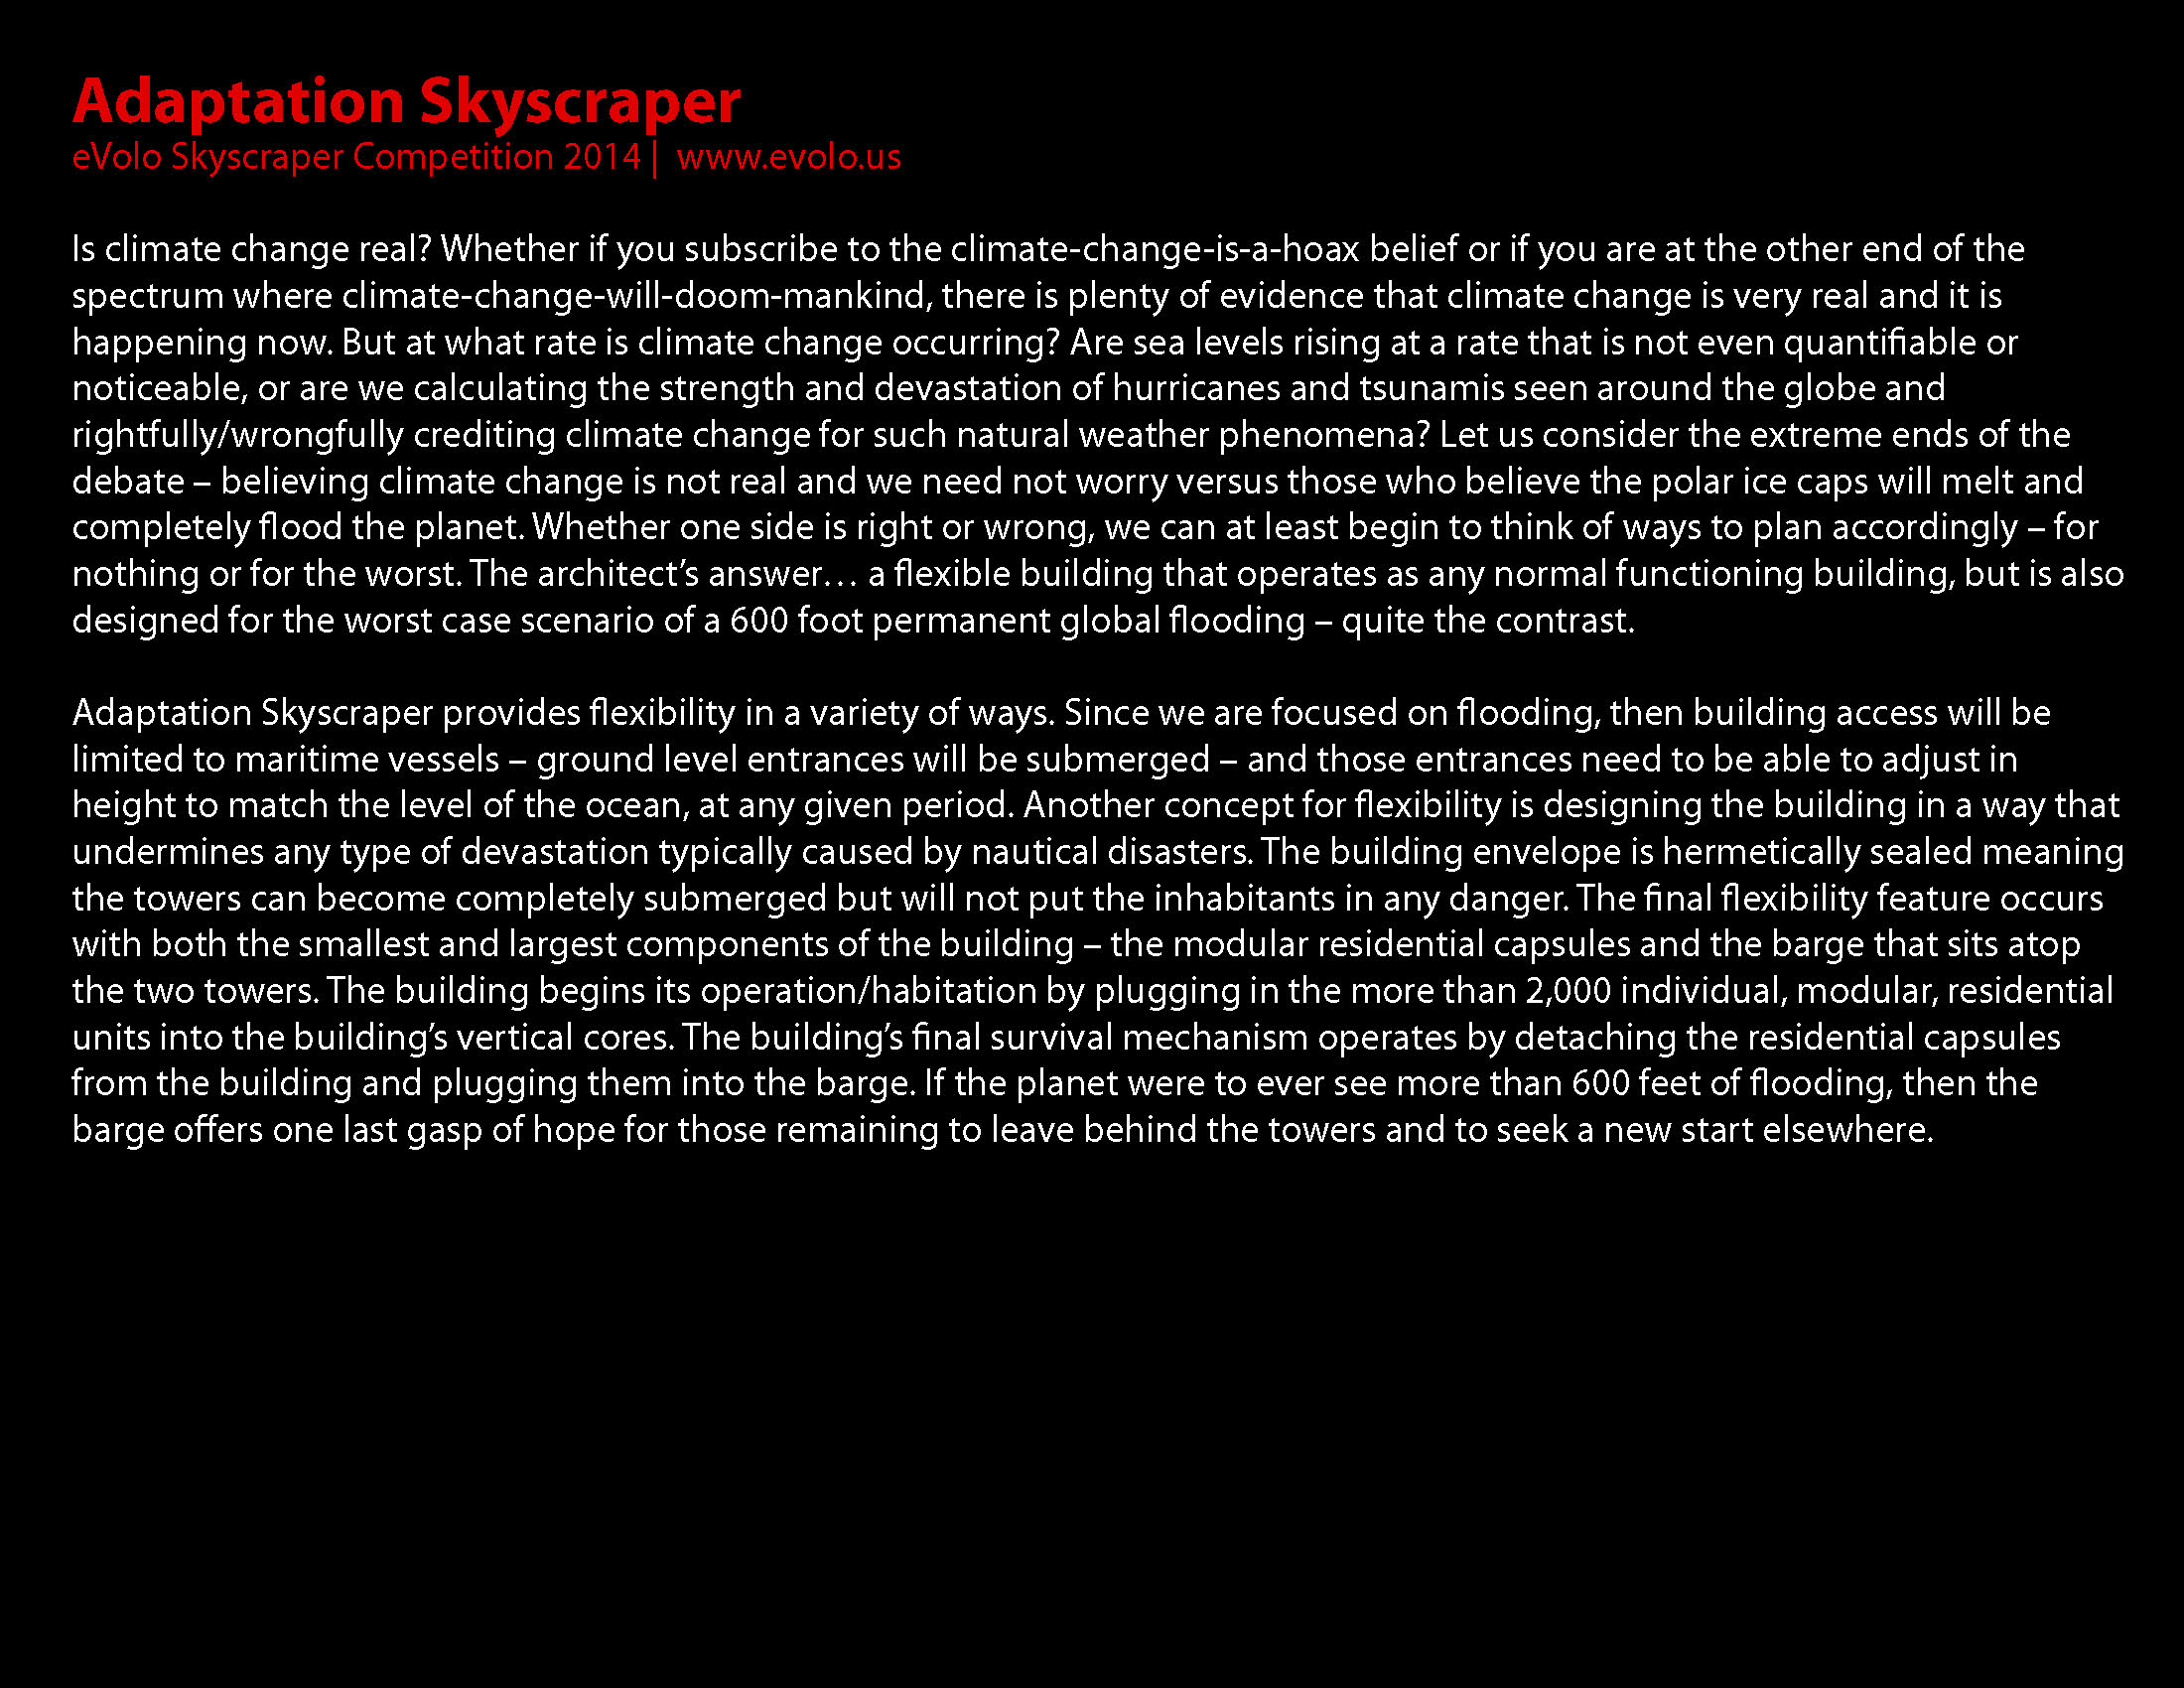 00.Project_Description-Adaptation-14_0310.jpg